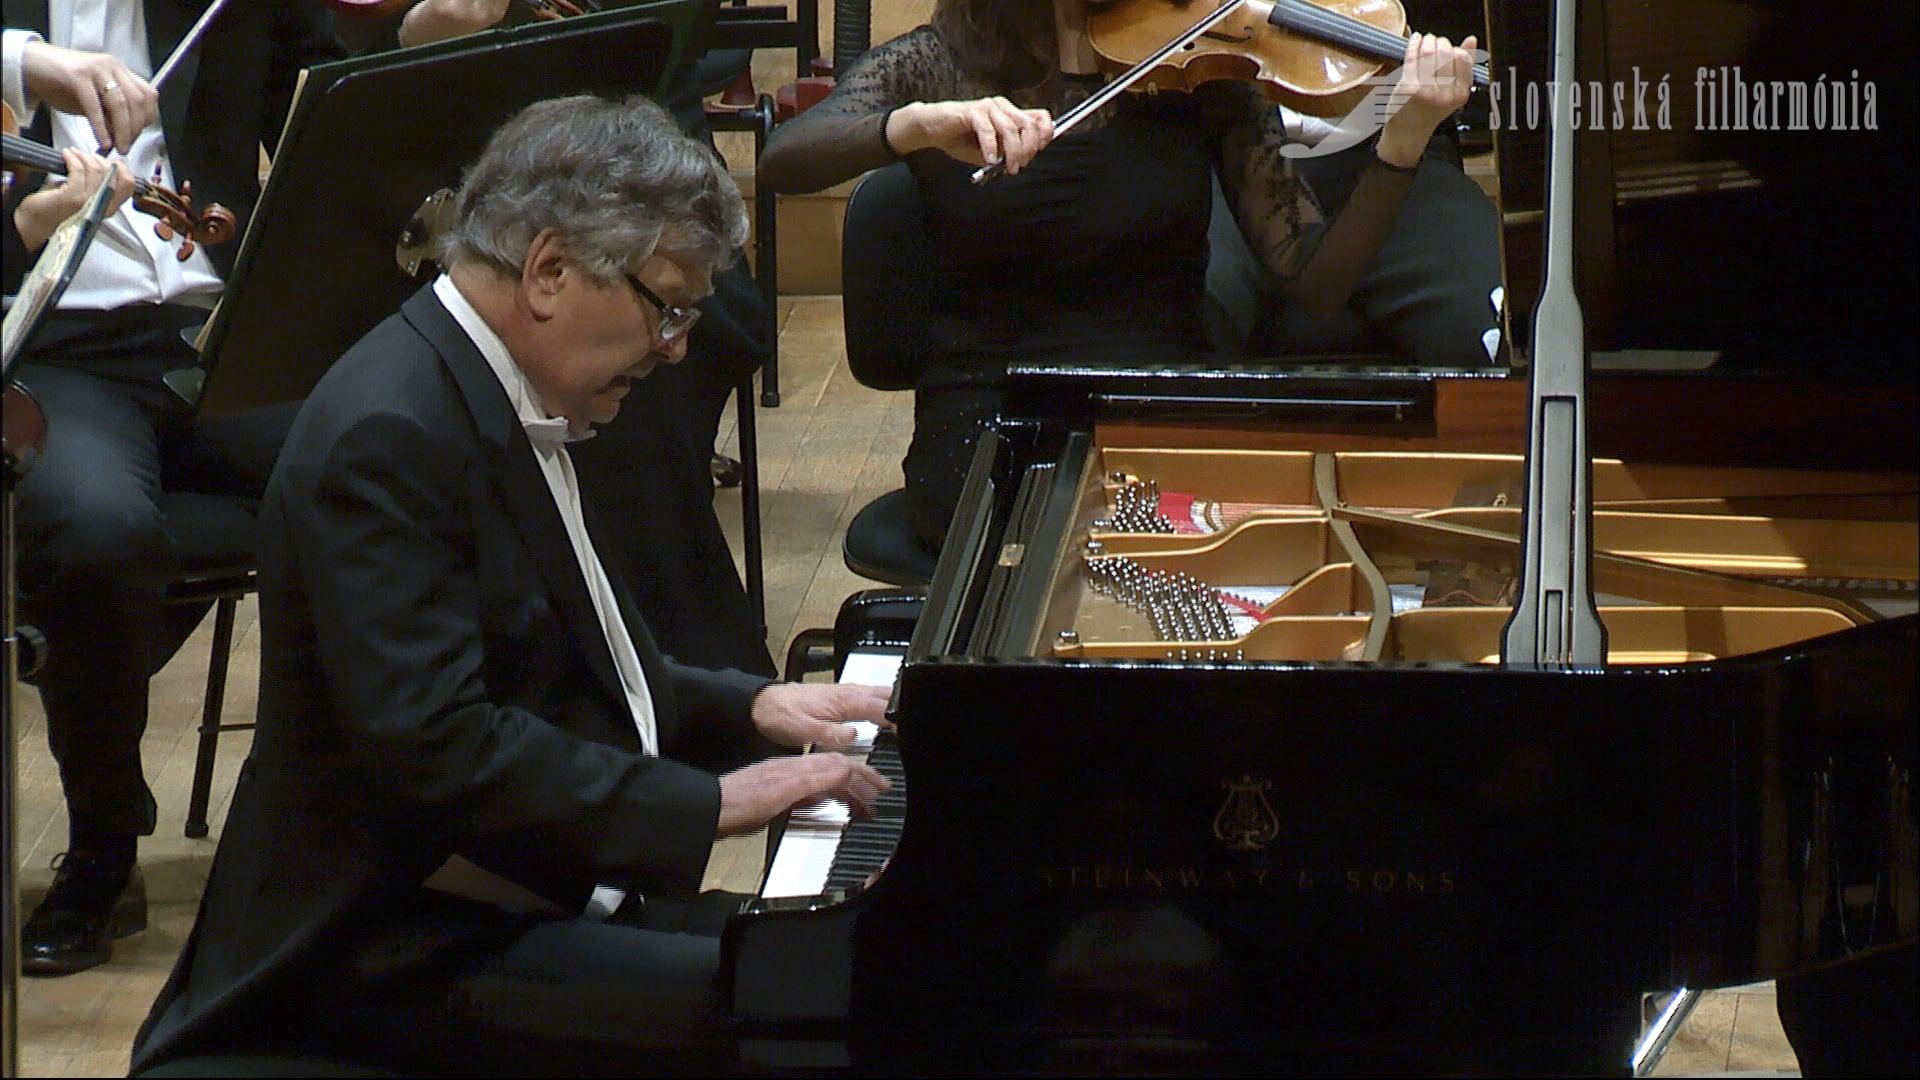 Petitgirard, Chopin, Dukas, Ravel